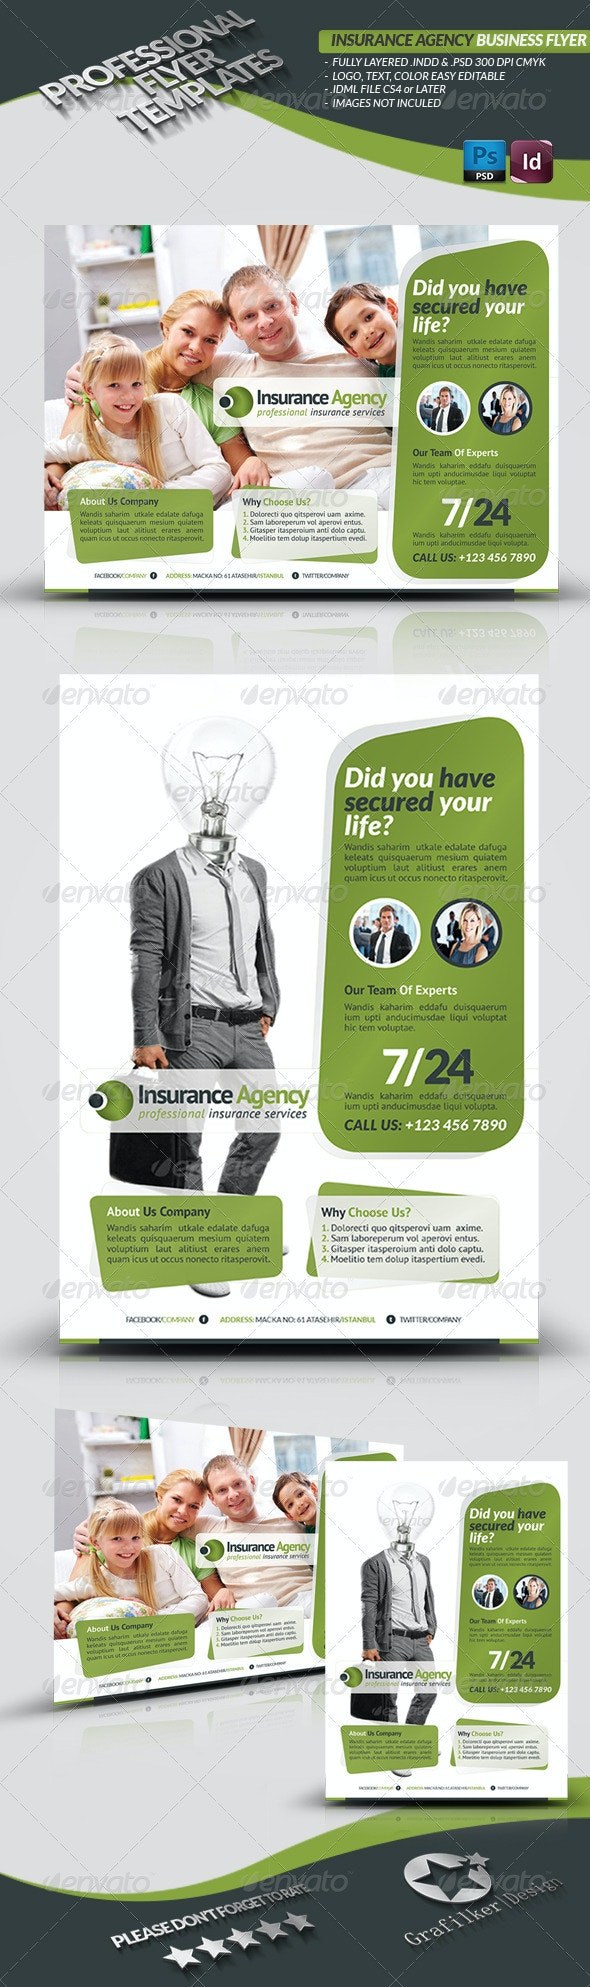 Insurance Agency Flyer - Corporate Flyers